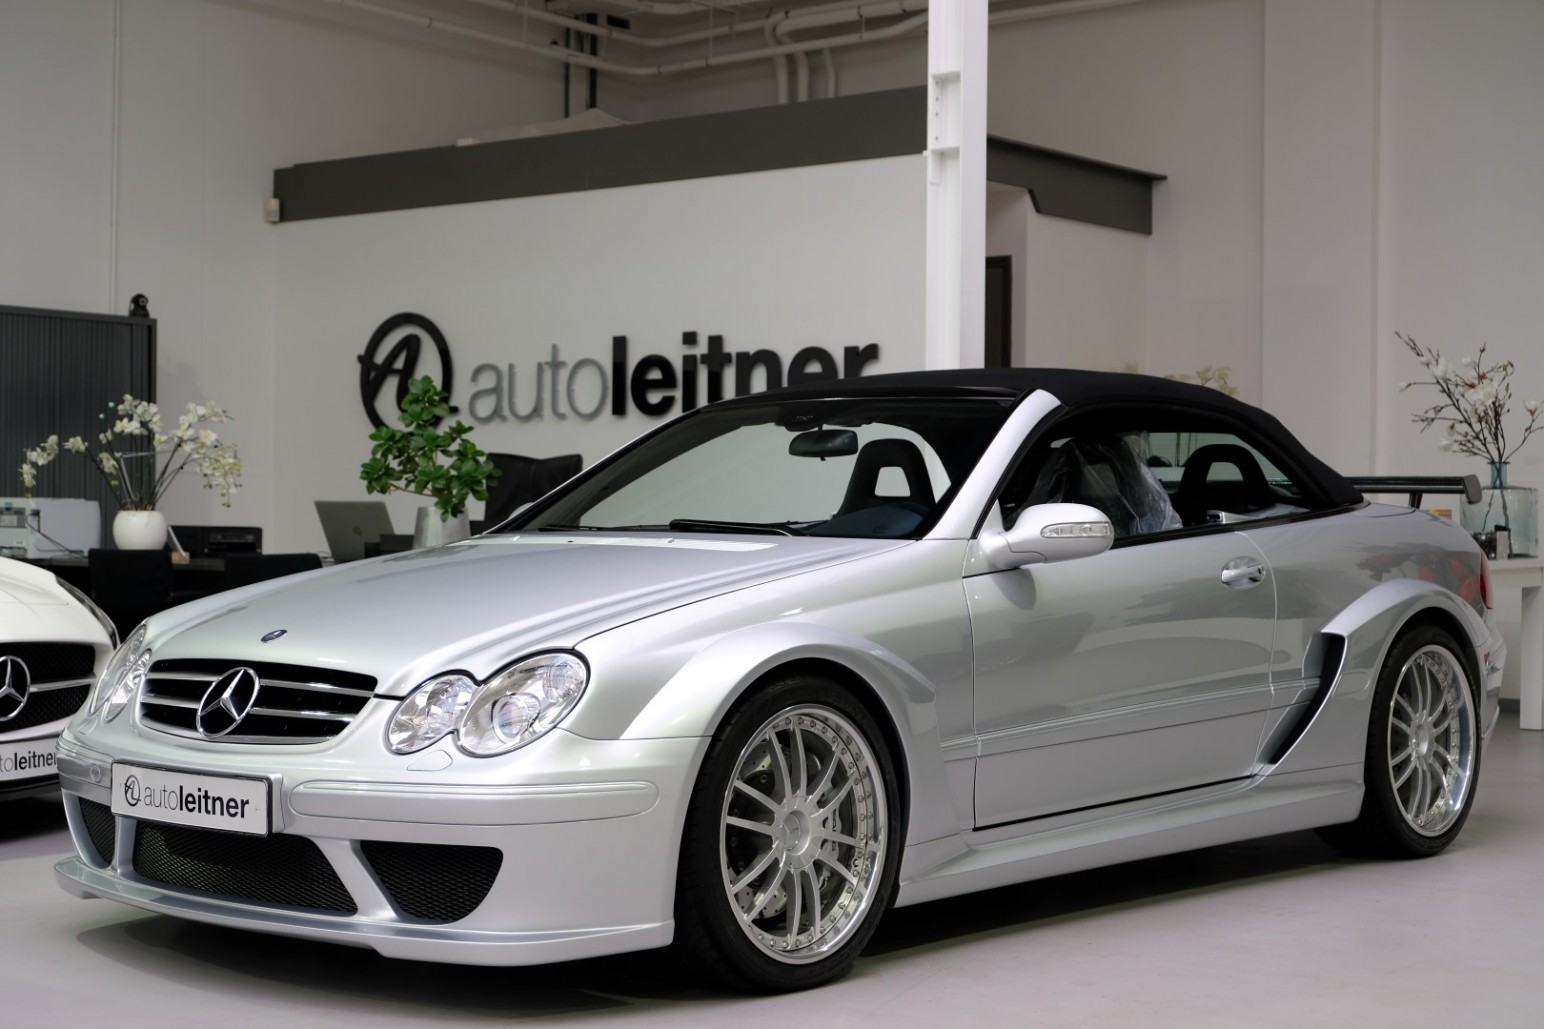 Mercedes-Benz CLK DTM AMG Cabriolet 2006